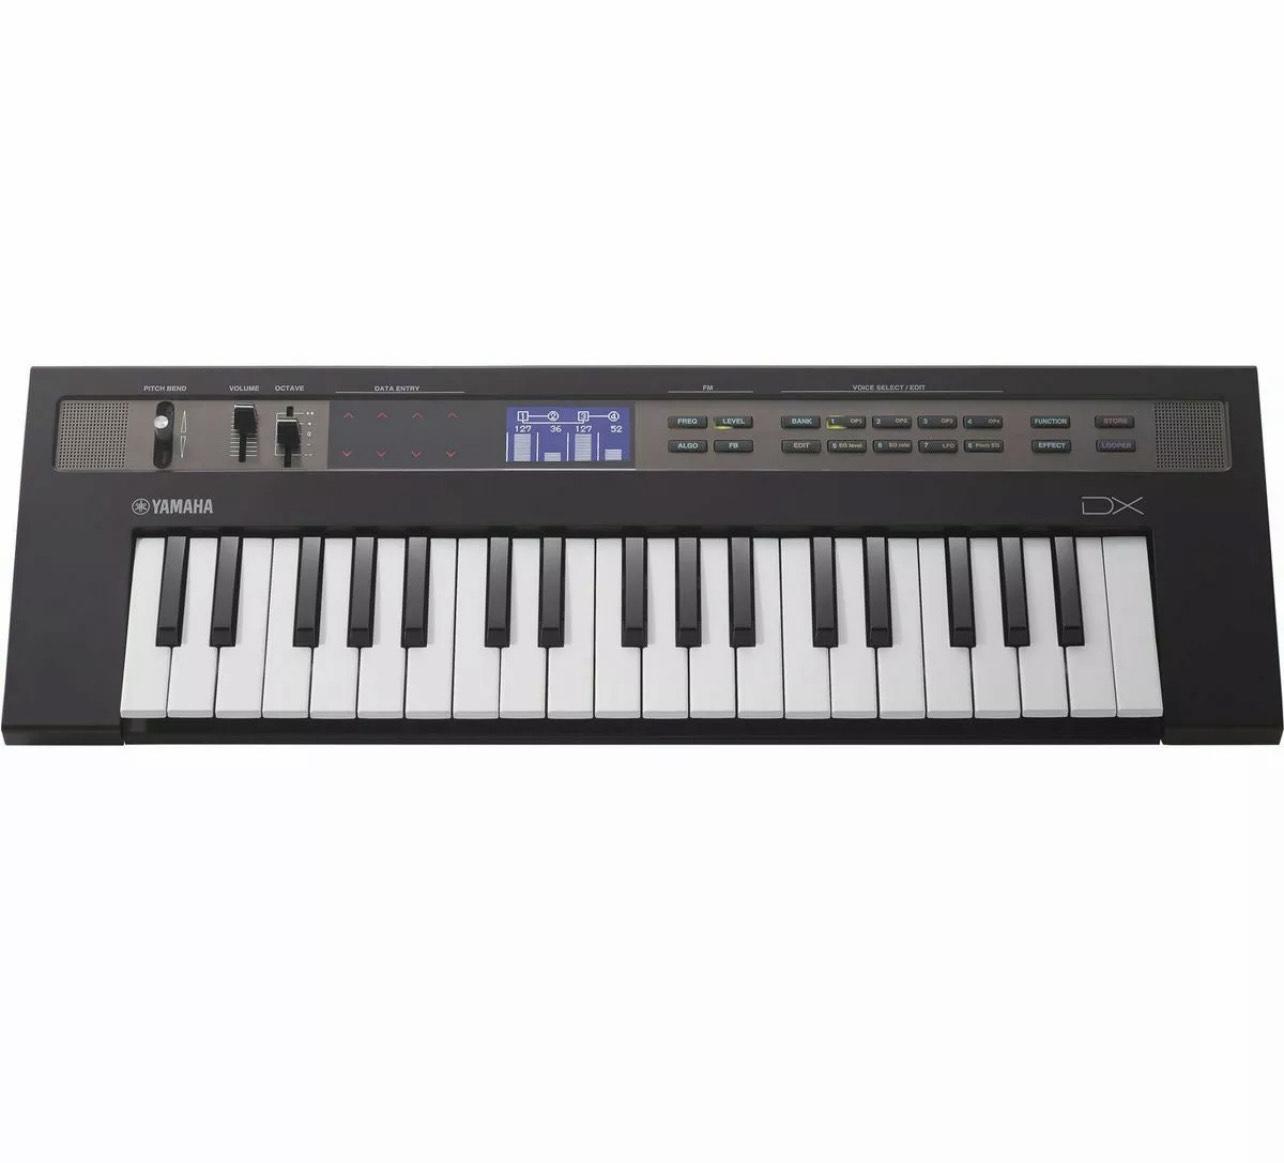 Yamaha REFACE DX Keyboard - £252.50 at ebay / music-matter